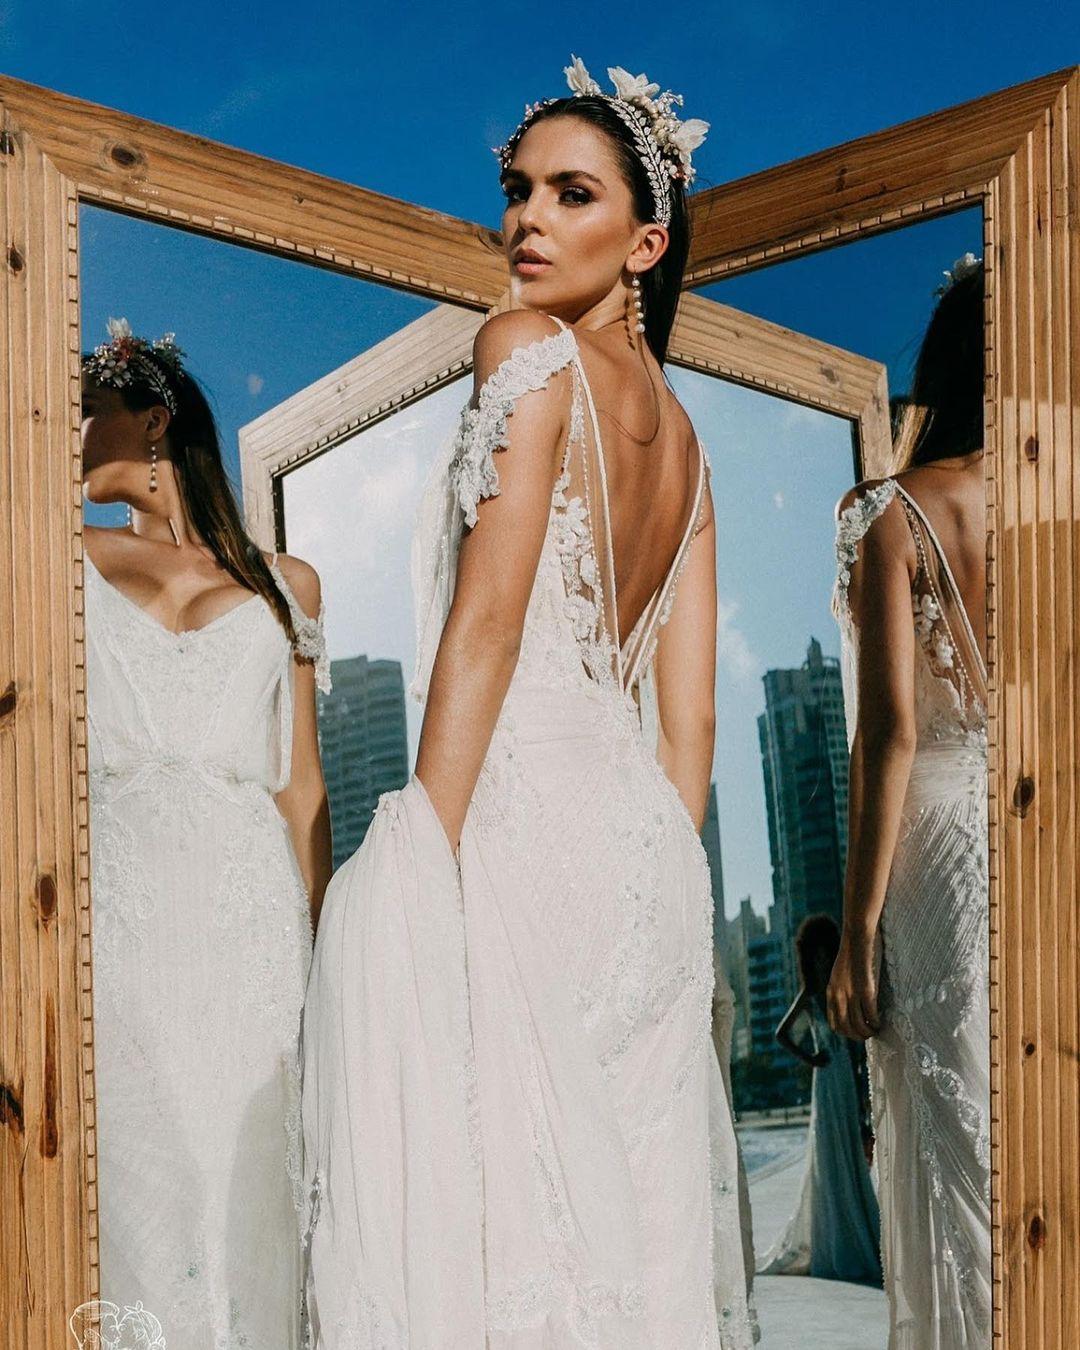 ana flavia giacomini, miss ilha dos lobos mundo 2019. - Página 9 Pcq7b10